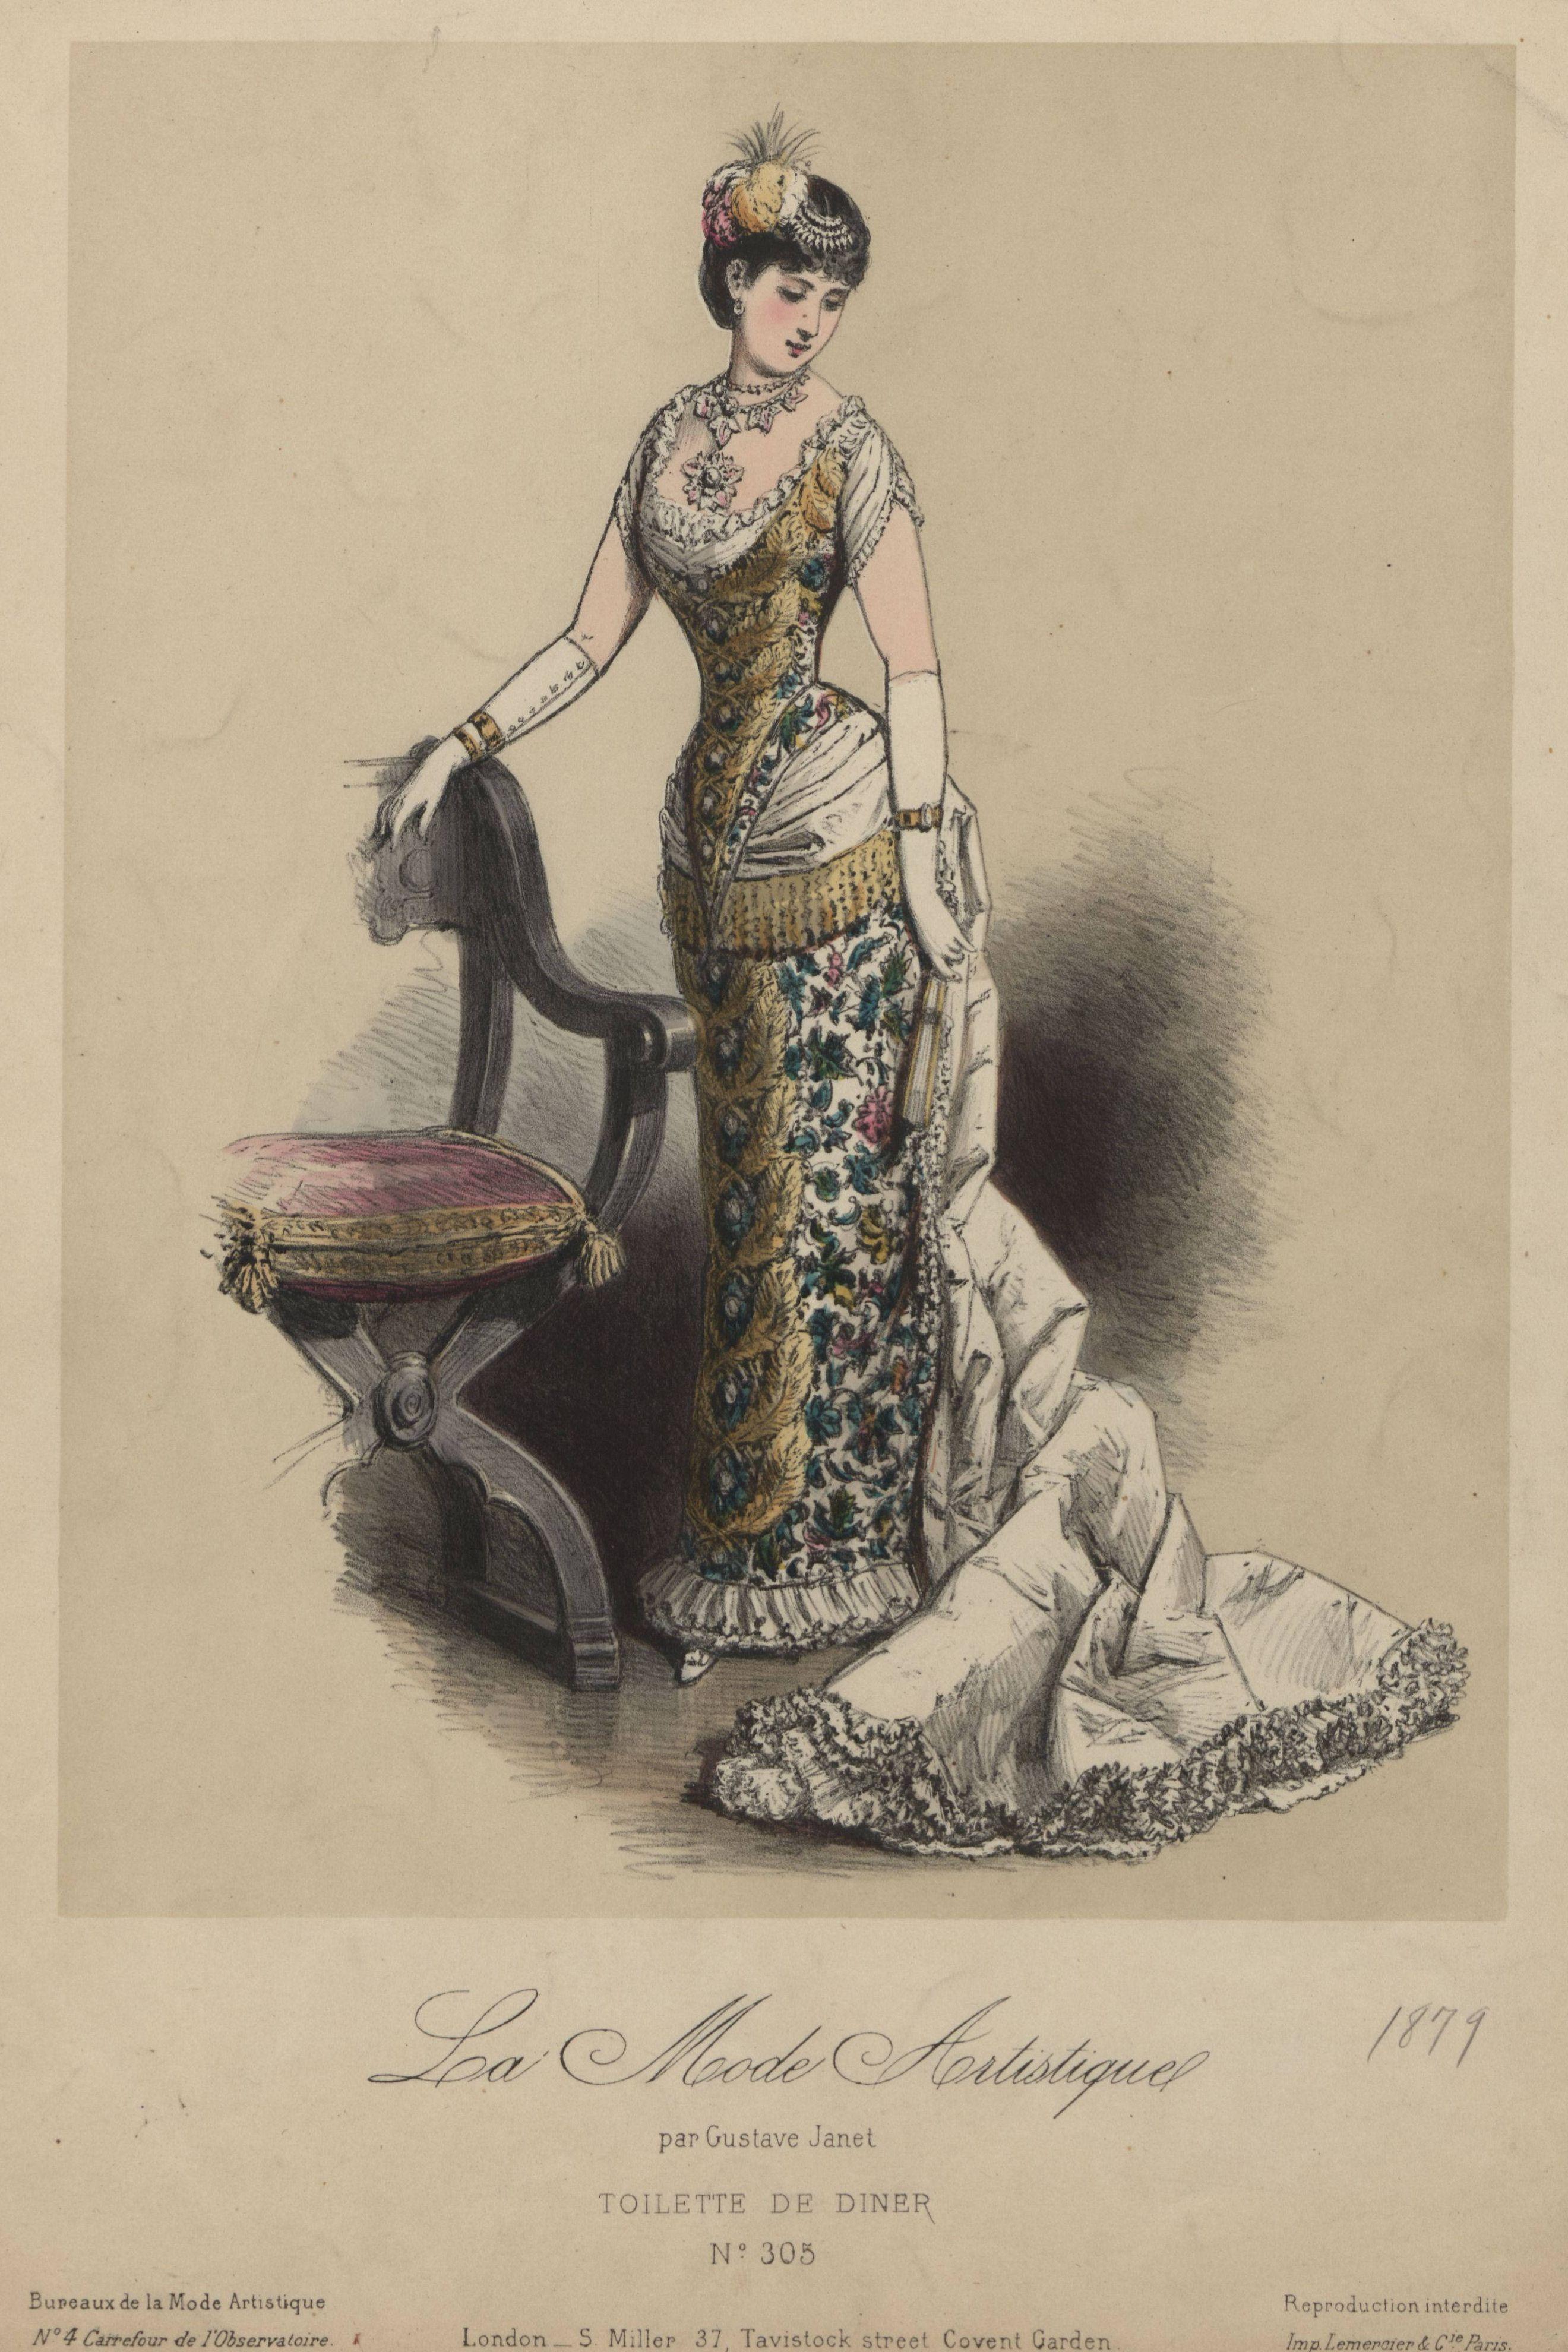 La mode artistique 1879 exquisite history of fashion for Exquisit mode